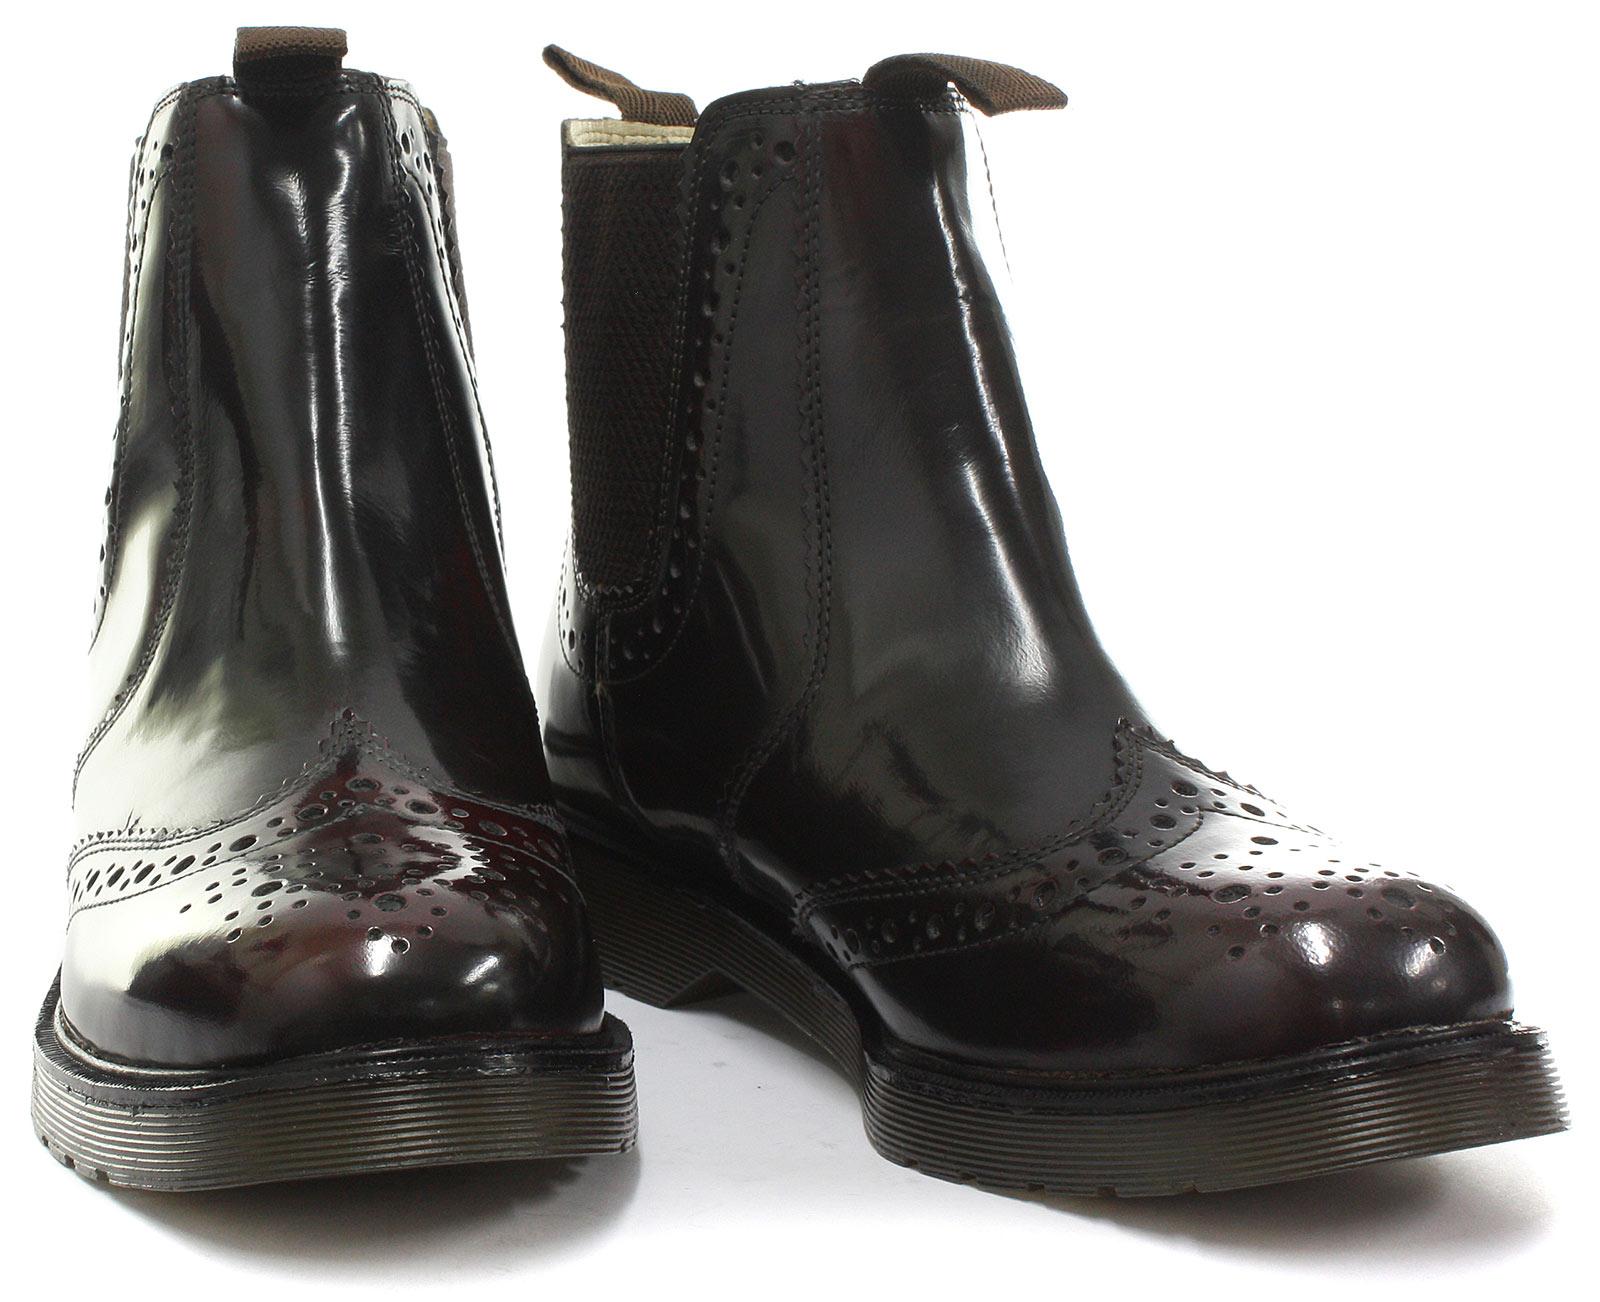 Grafters Oxblood Leather Brogue Gusset Dealer Stiefel Mens Stiefel Dealer Größe UK 12 (EU 47) abbfa1